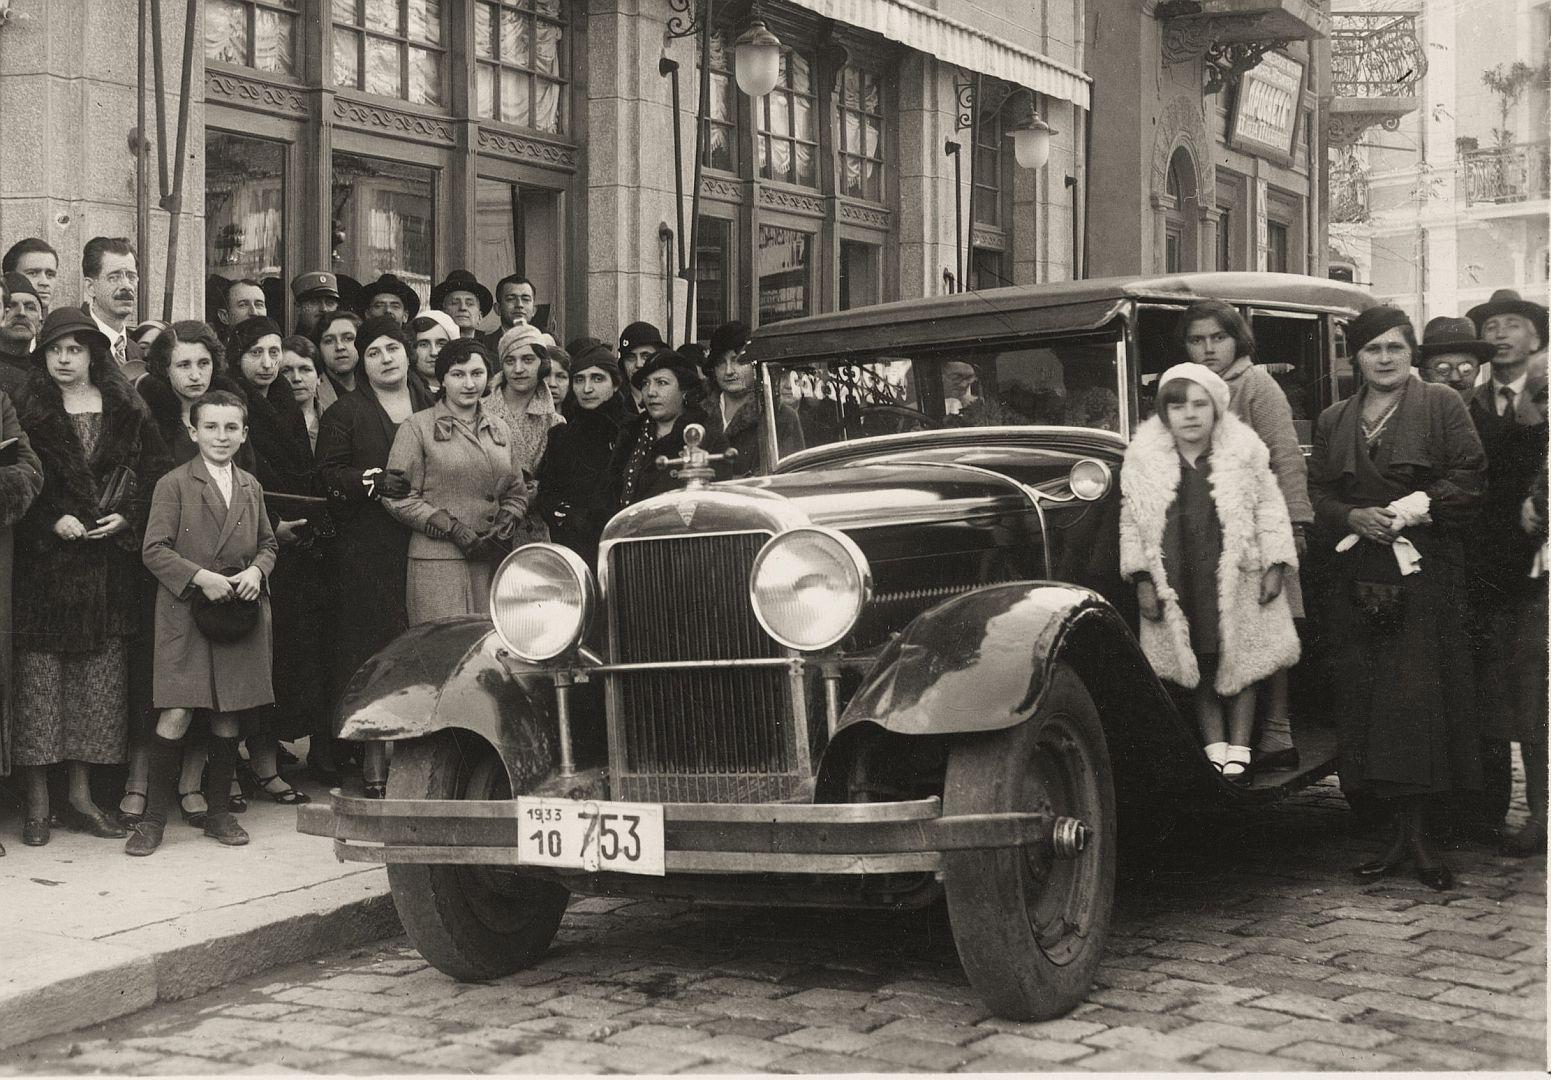 hudson_super_six_1928_bitola_grand-hotel_mazedonien_1933_galerie